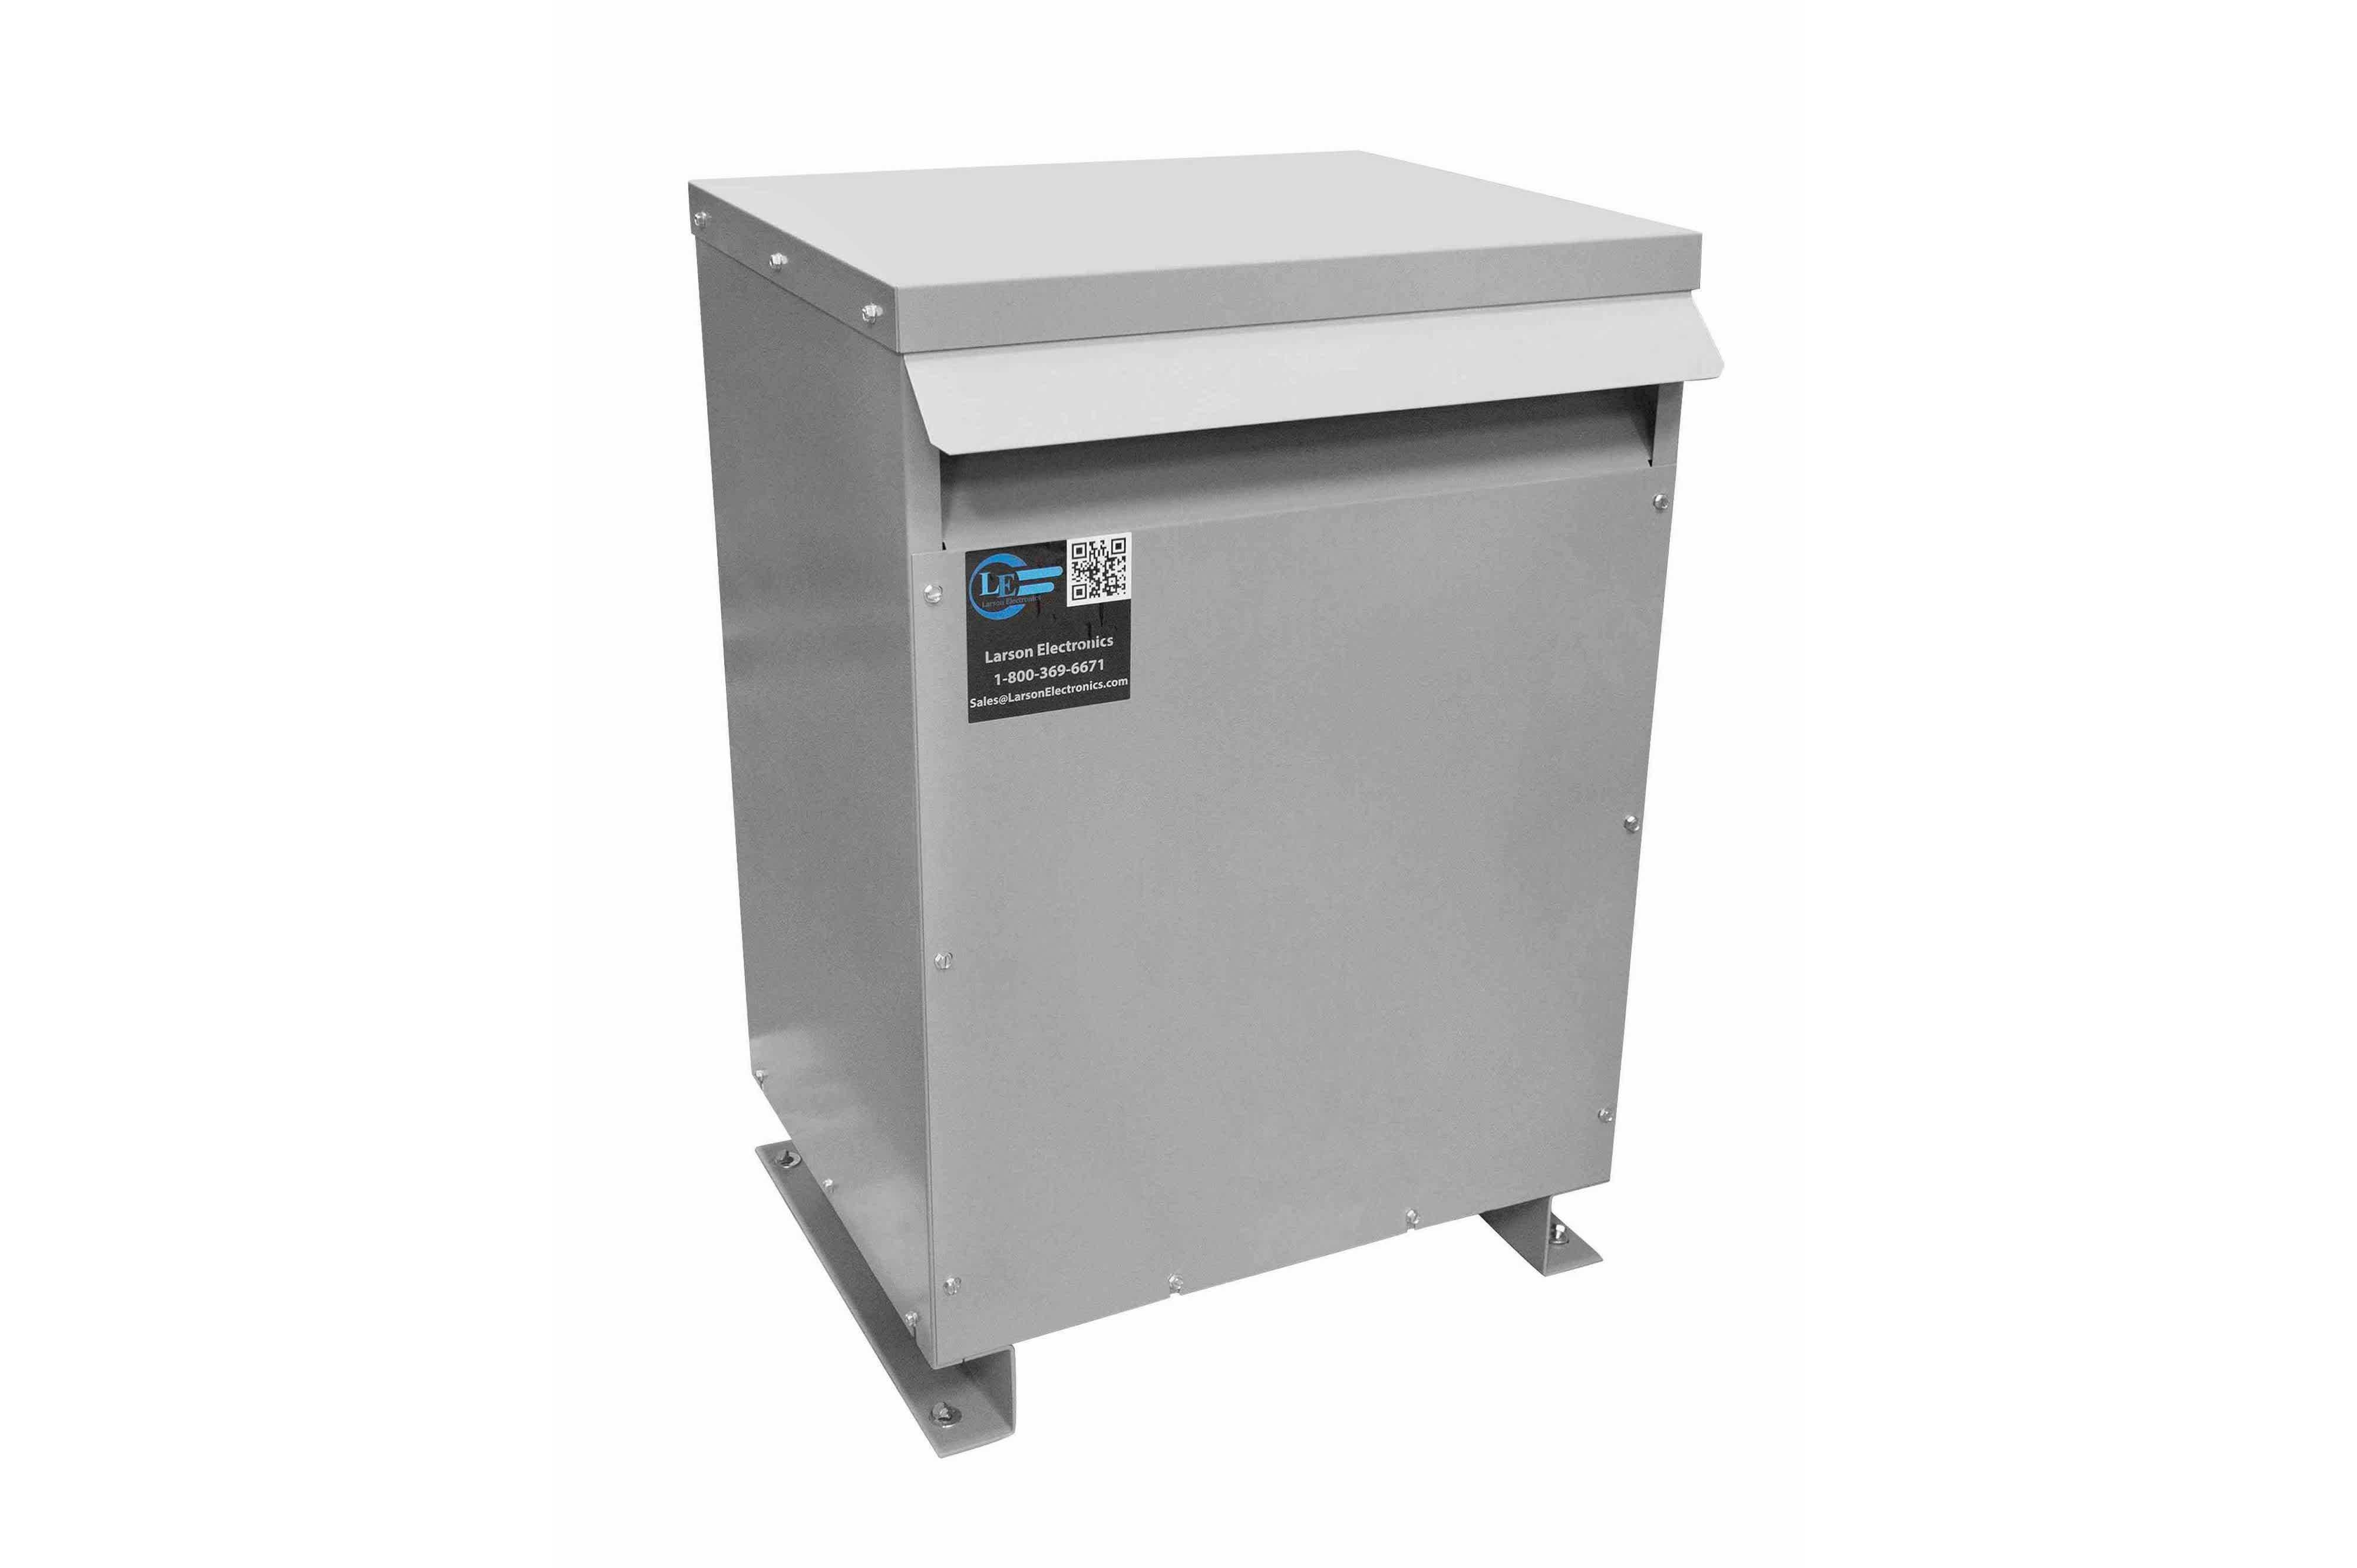 26 kVA 3PH Isolation Transformer, 480V Wye Primary, 240V Delta Secondary, N3R, Ventilated, 60 Hz